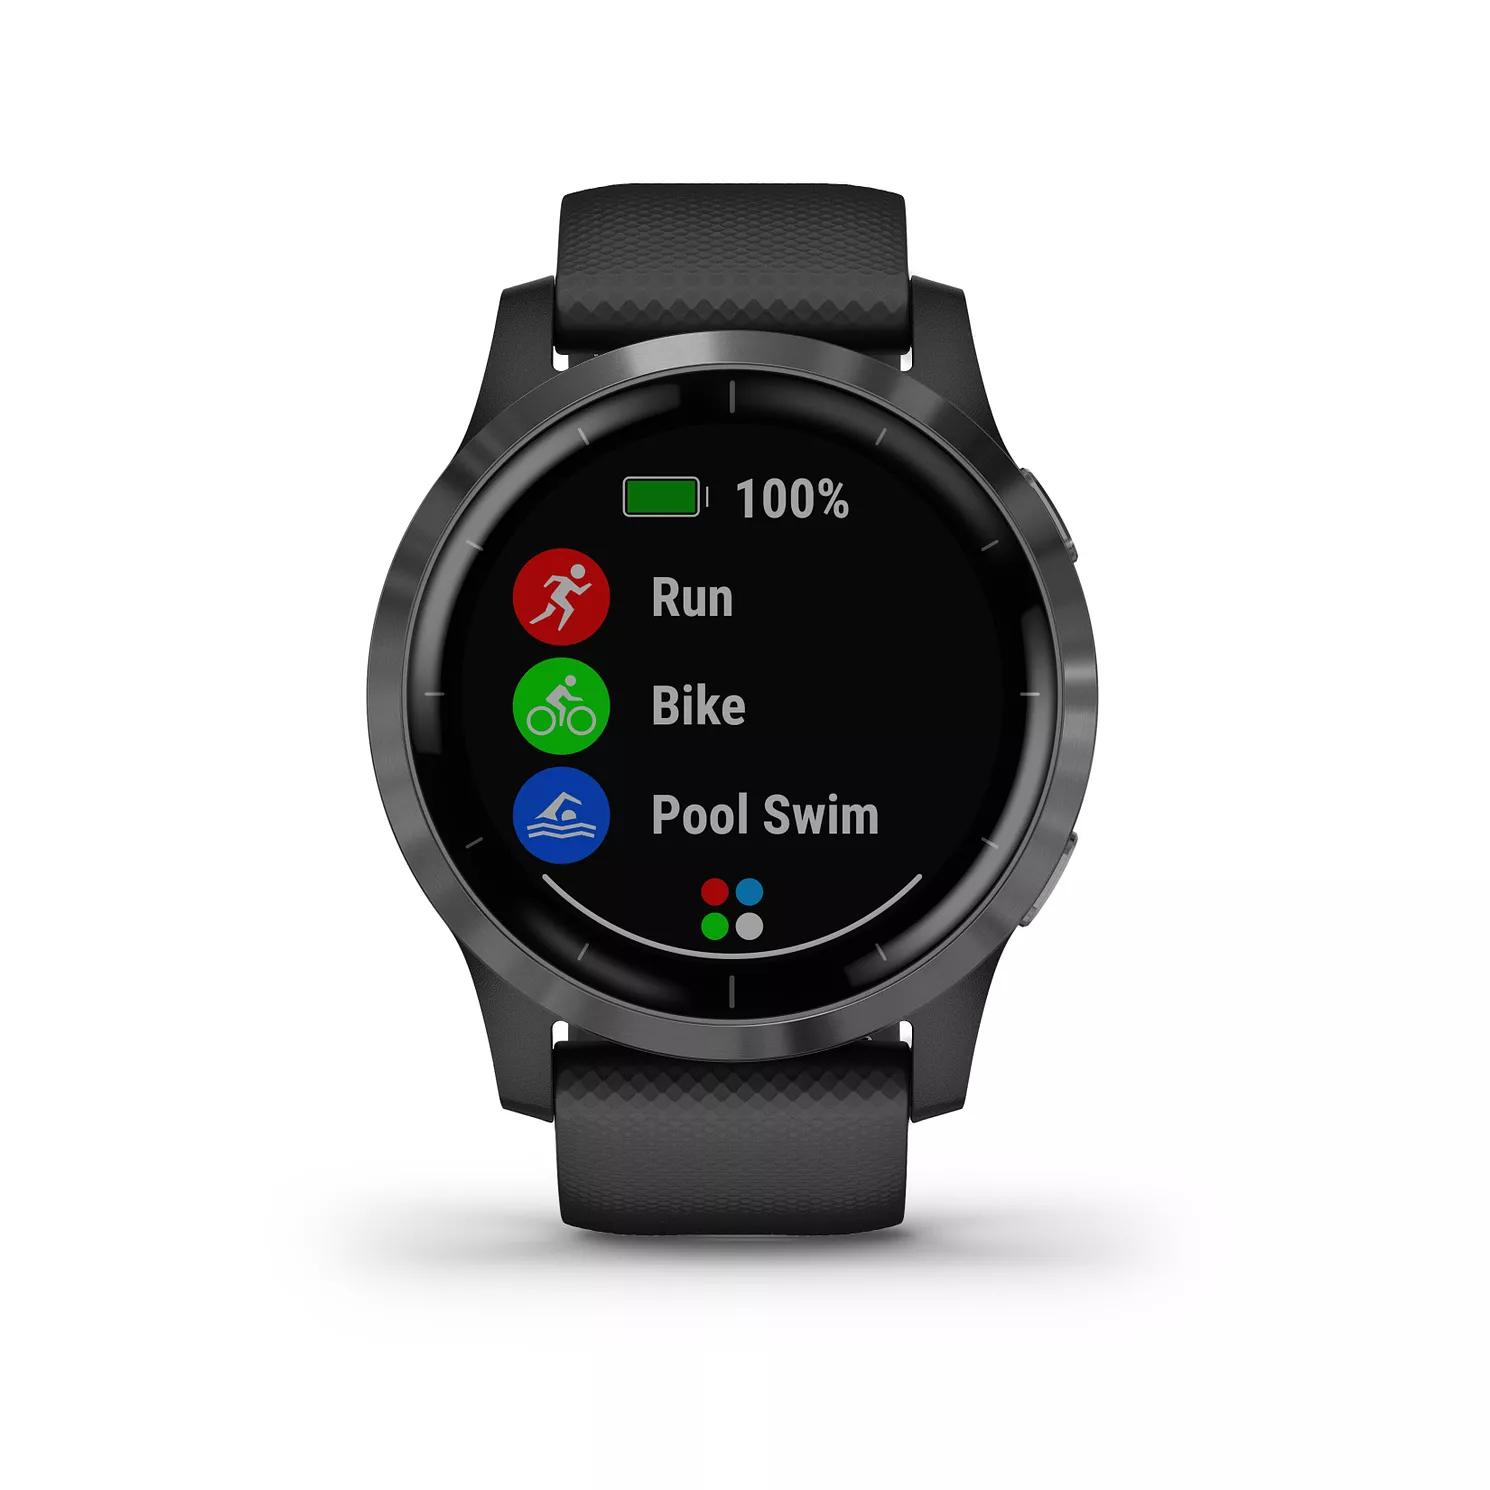 Garmin Vivoactive 4 Black Silicone Strap Smartwatch £223.99 H Samuel (discount shown in basket)